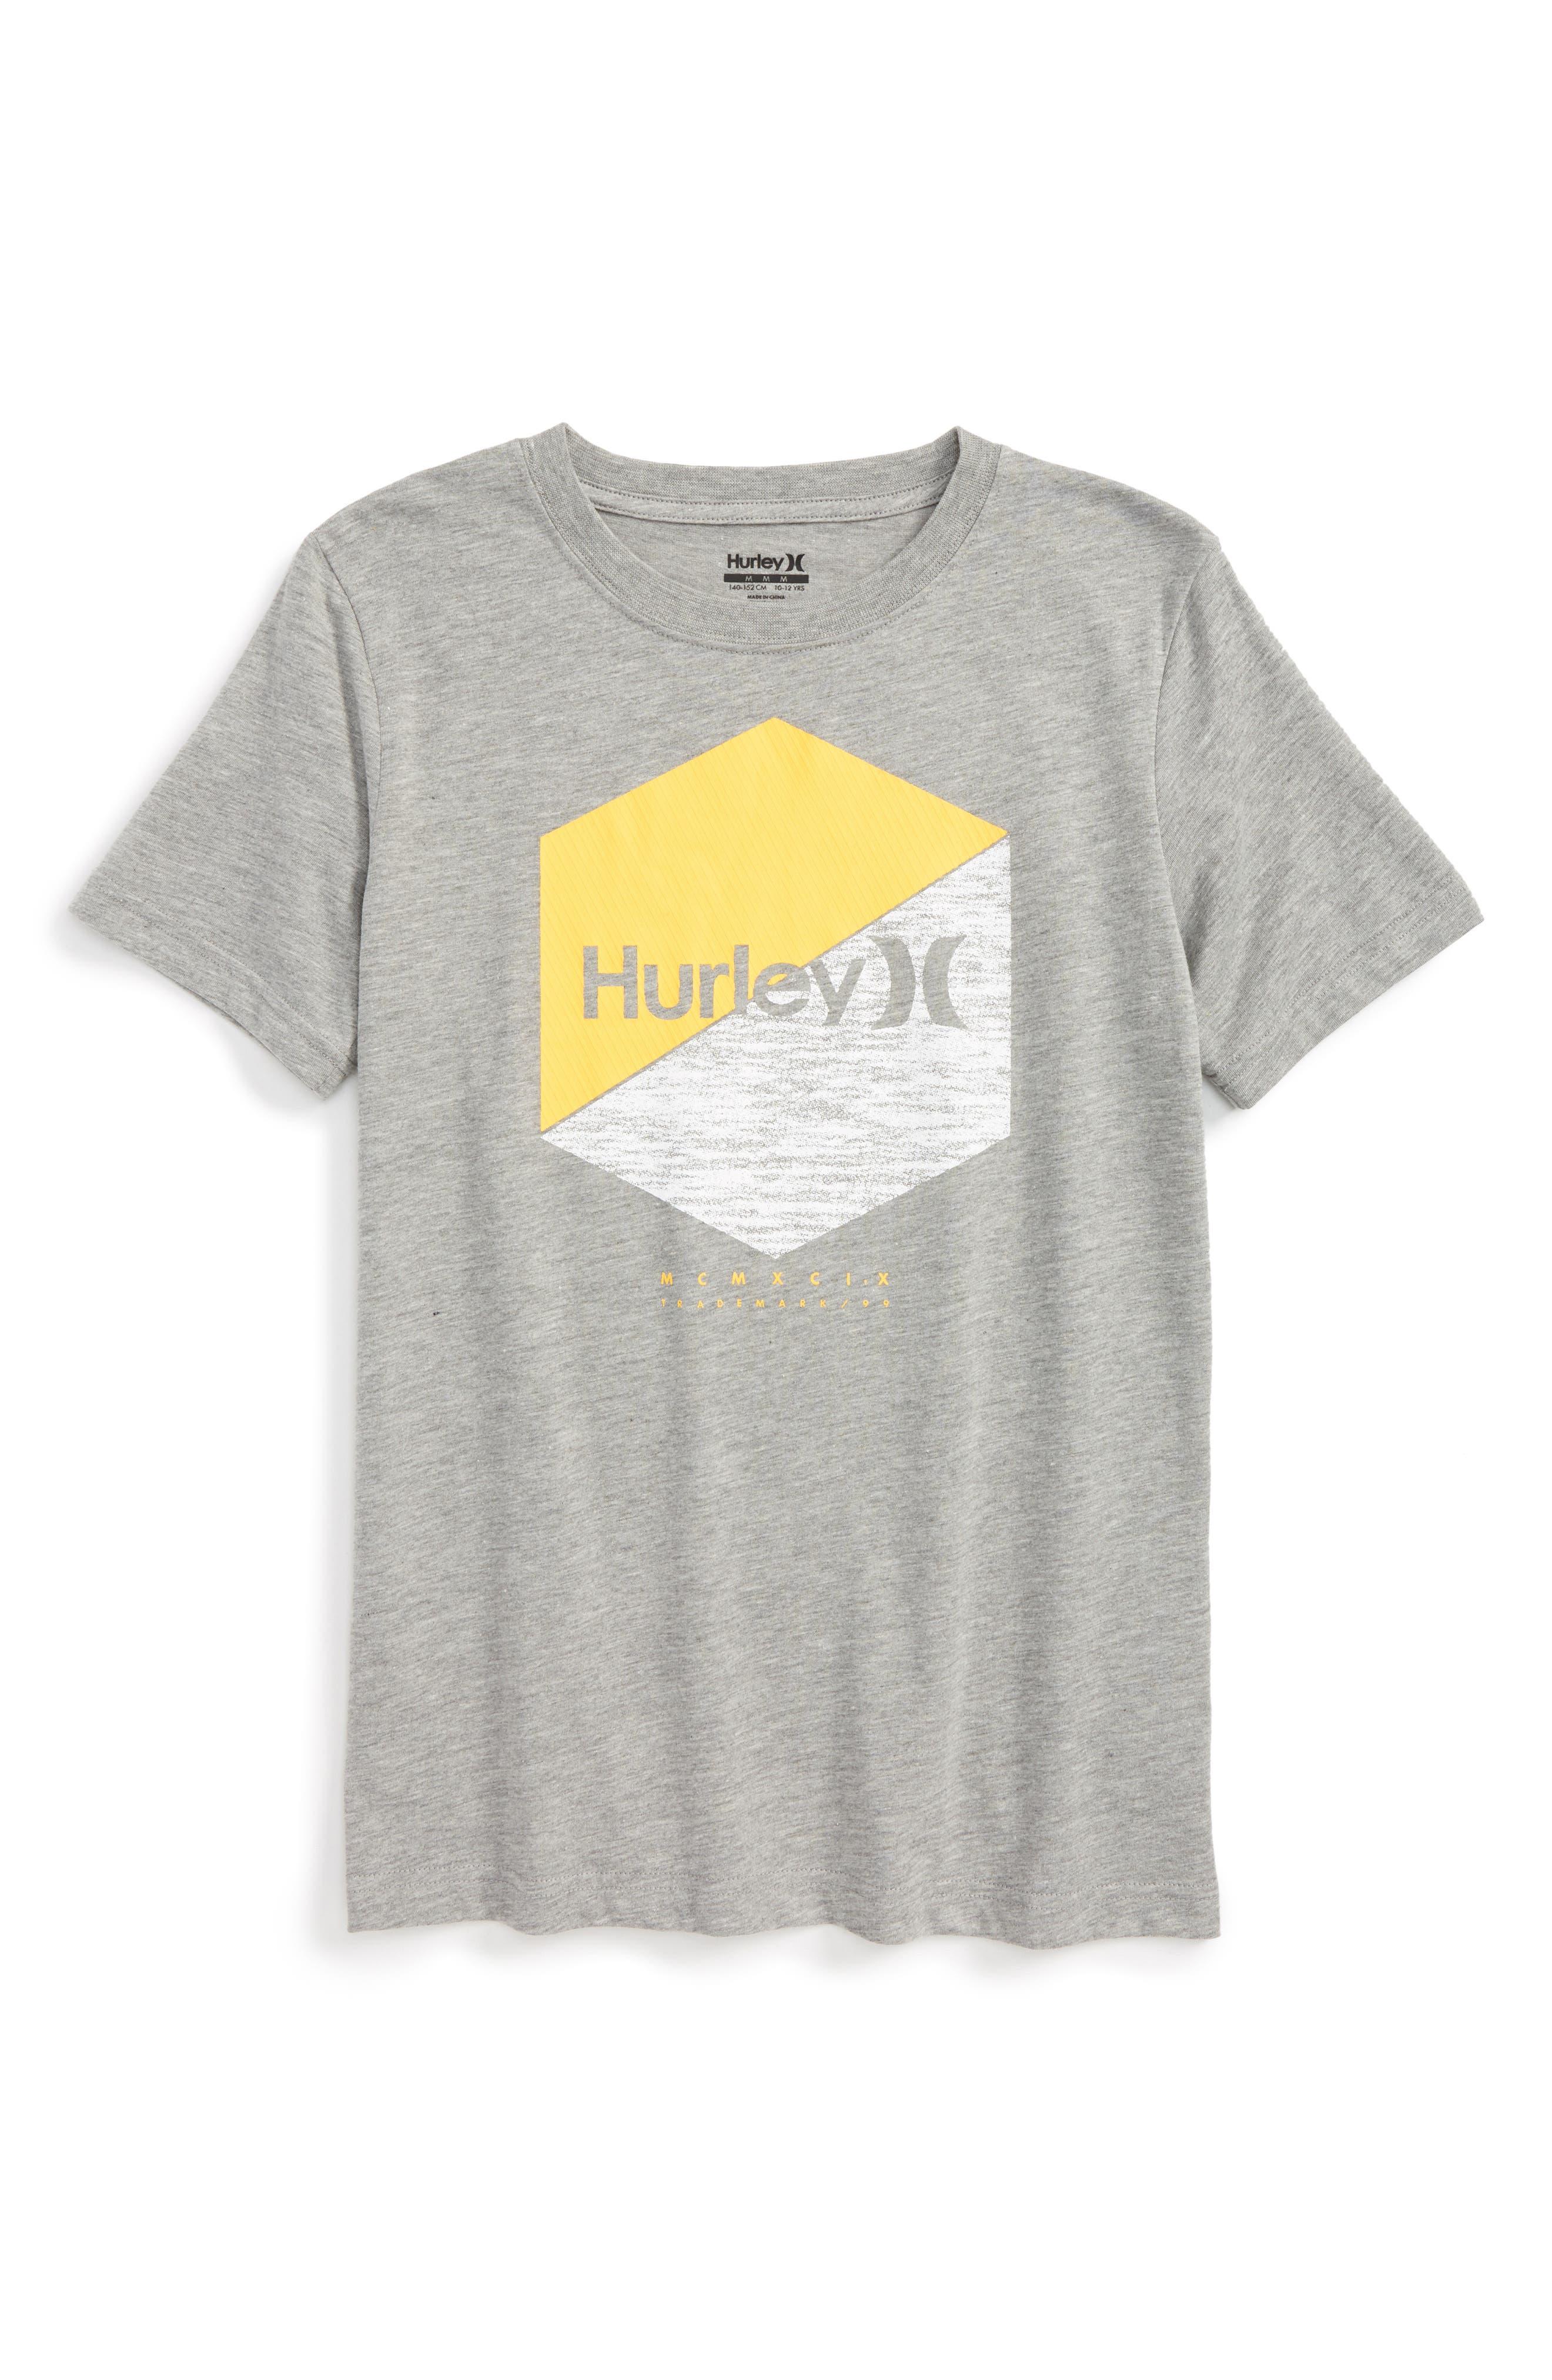 Hurley Two Times Graphic T-Shirt (Big Boys)